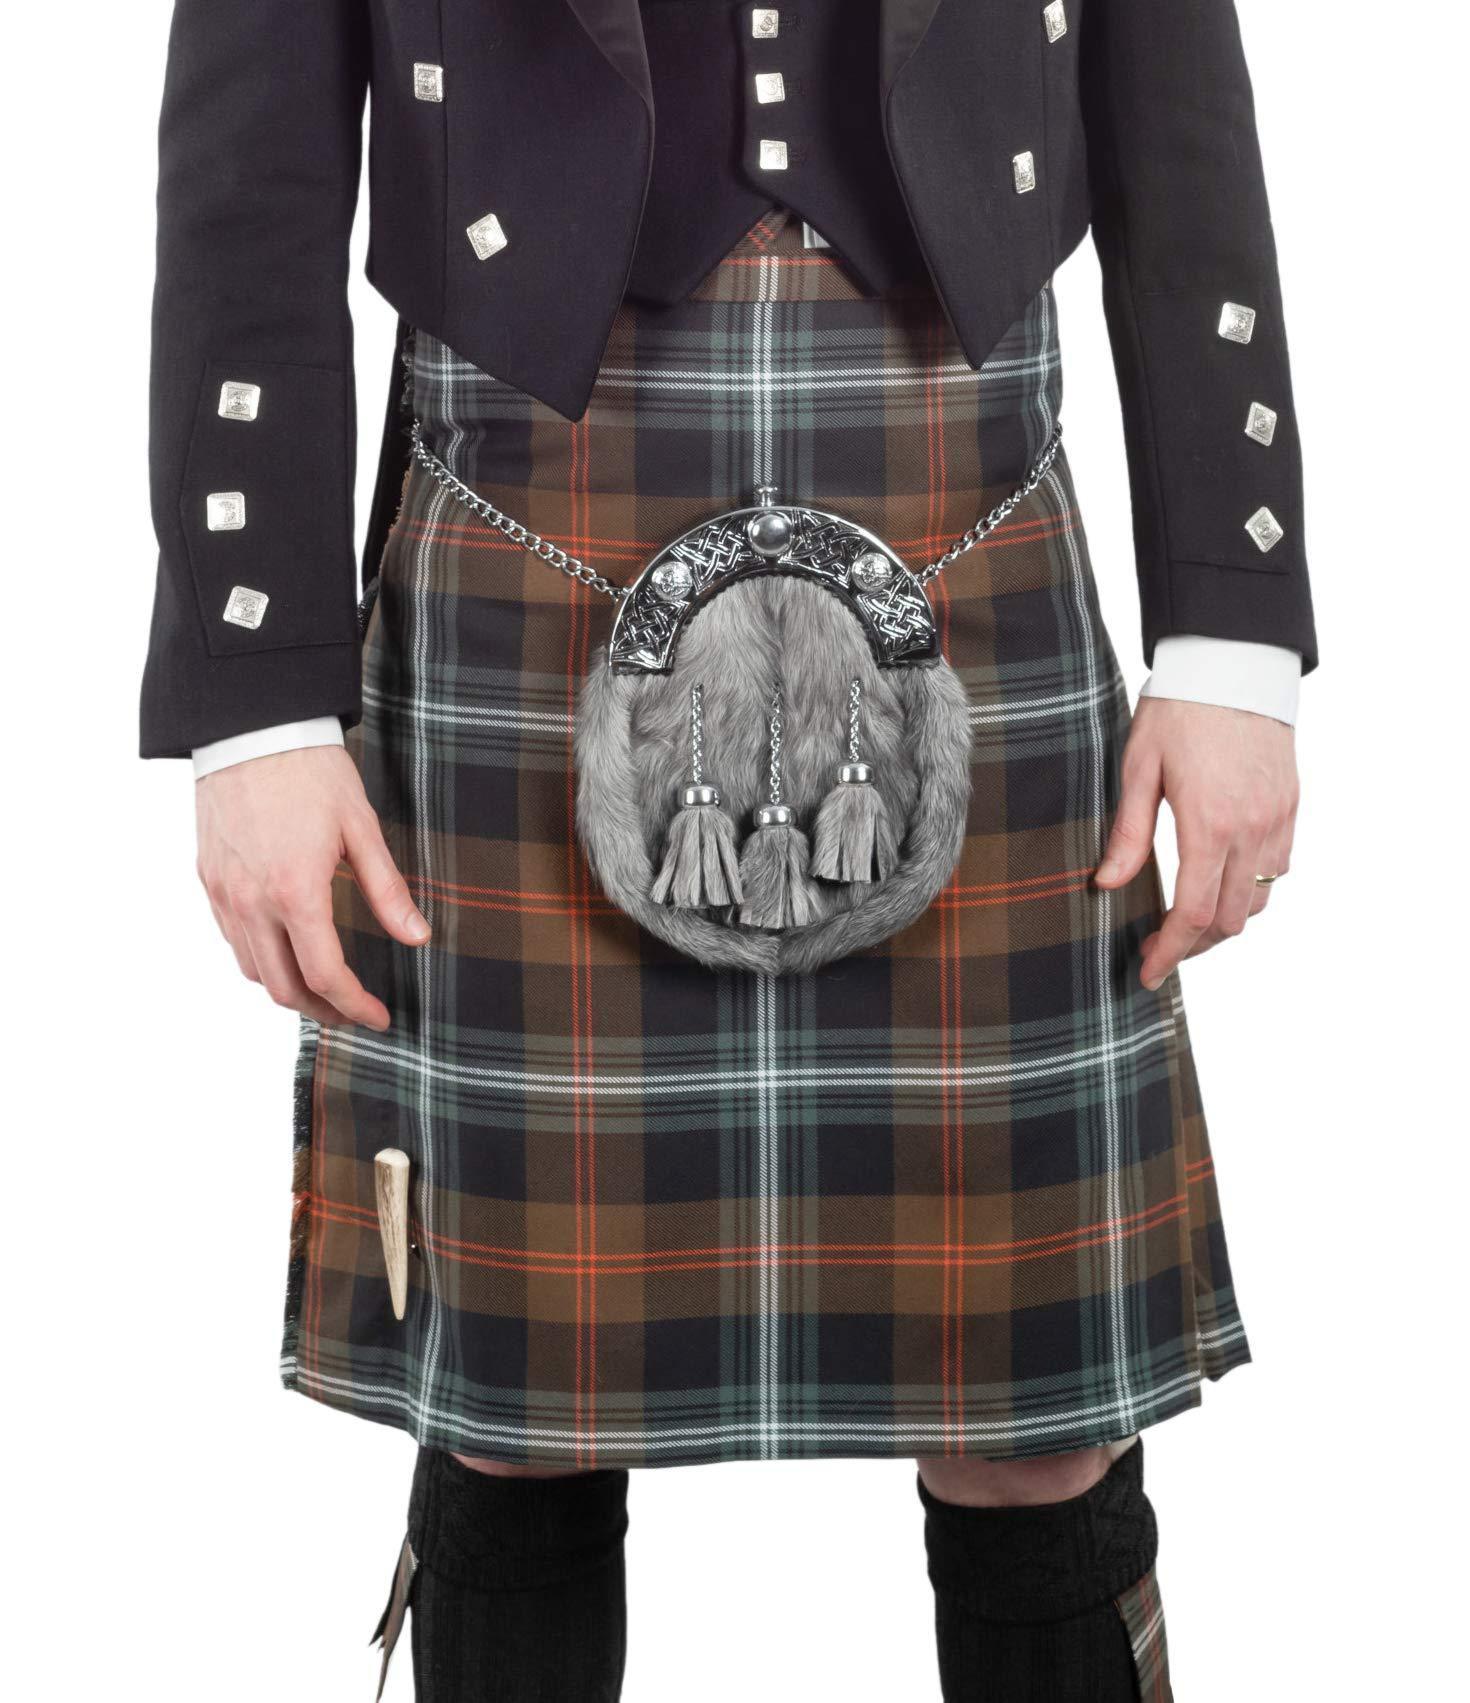 Kilt Society Mens 8 Yard Scottish Kilt Persevere Weathered Brown Tartan 36'' to 40''